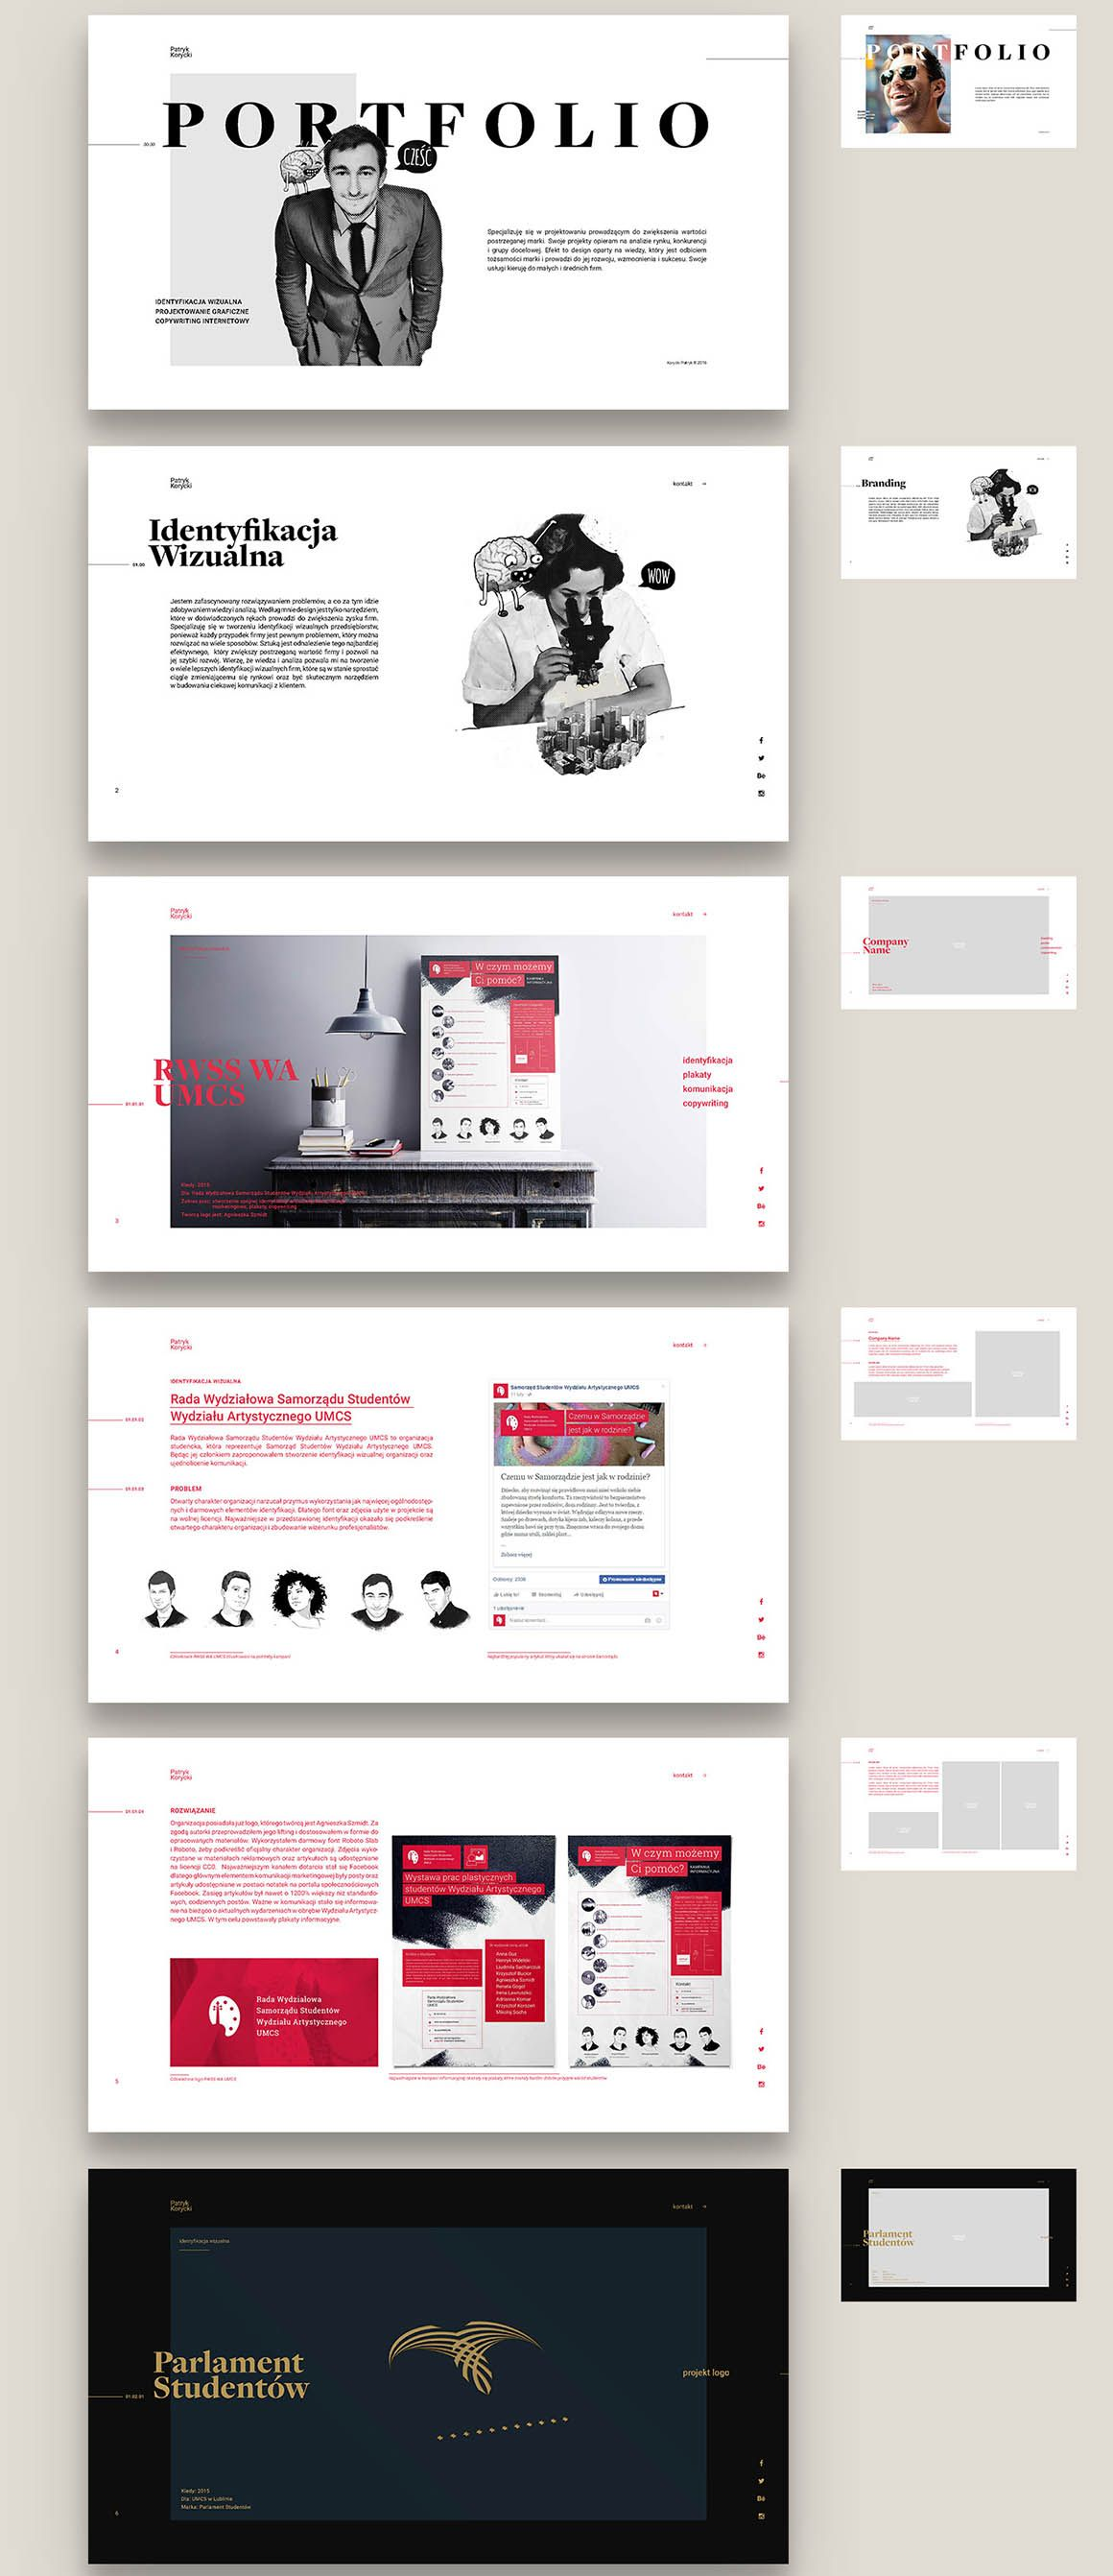 Free Minimal Portfolio Brochure Dealjumbo Com Discounted Design Bundles With Extended Li In 2020 Portfolio Design Layout Portfolio Design Portfolio Template Design